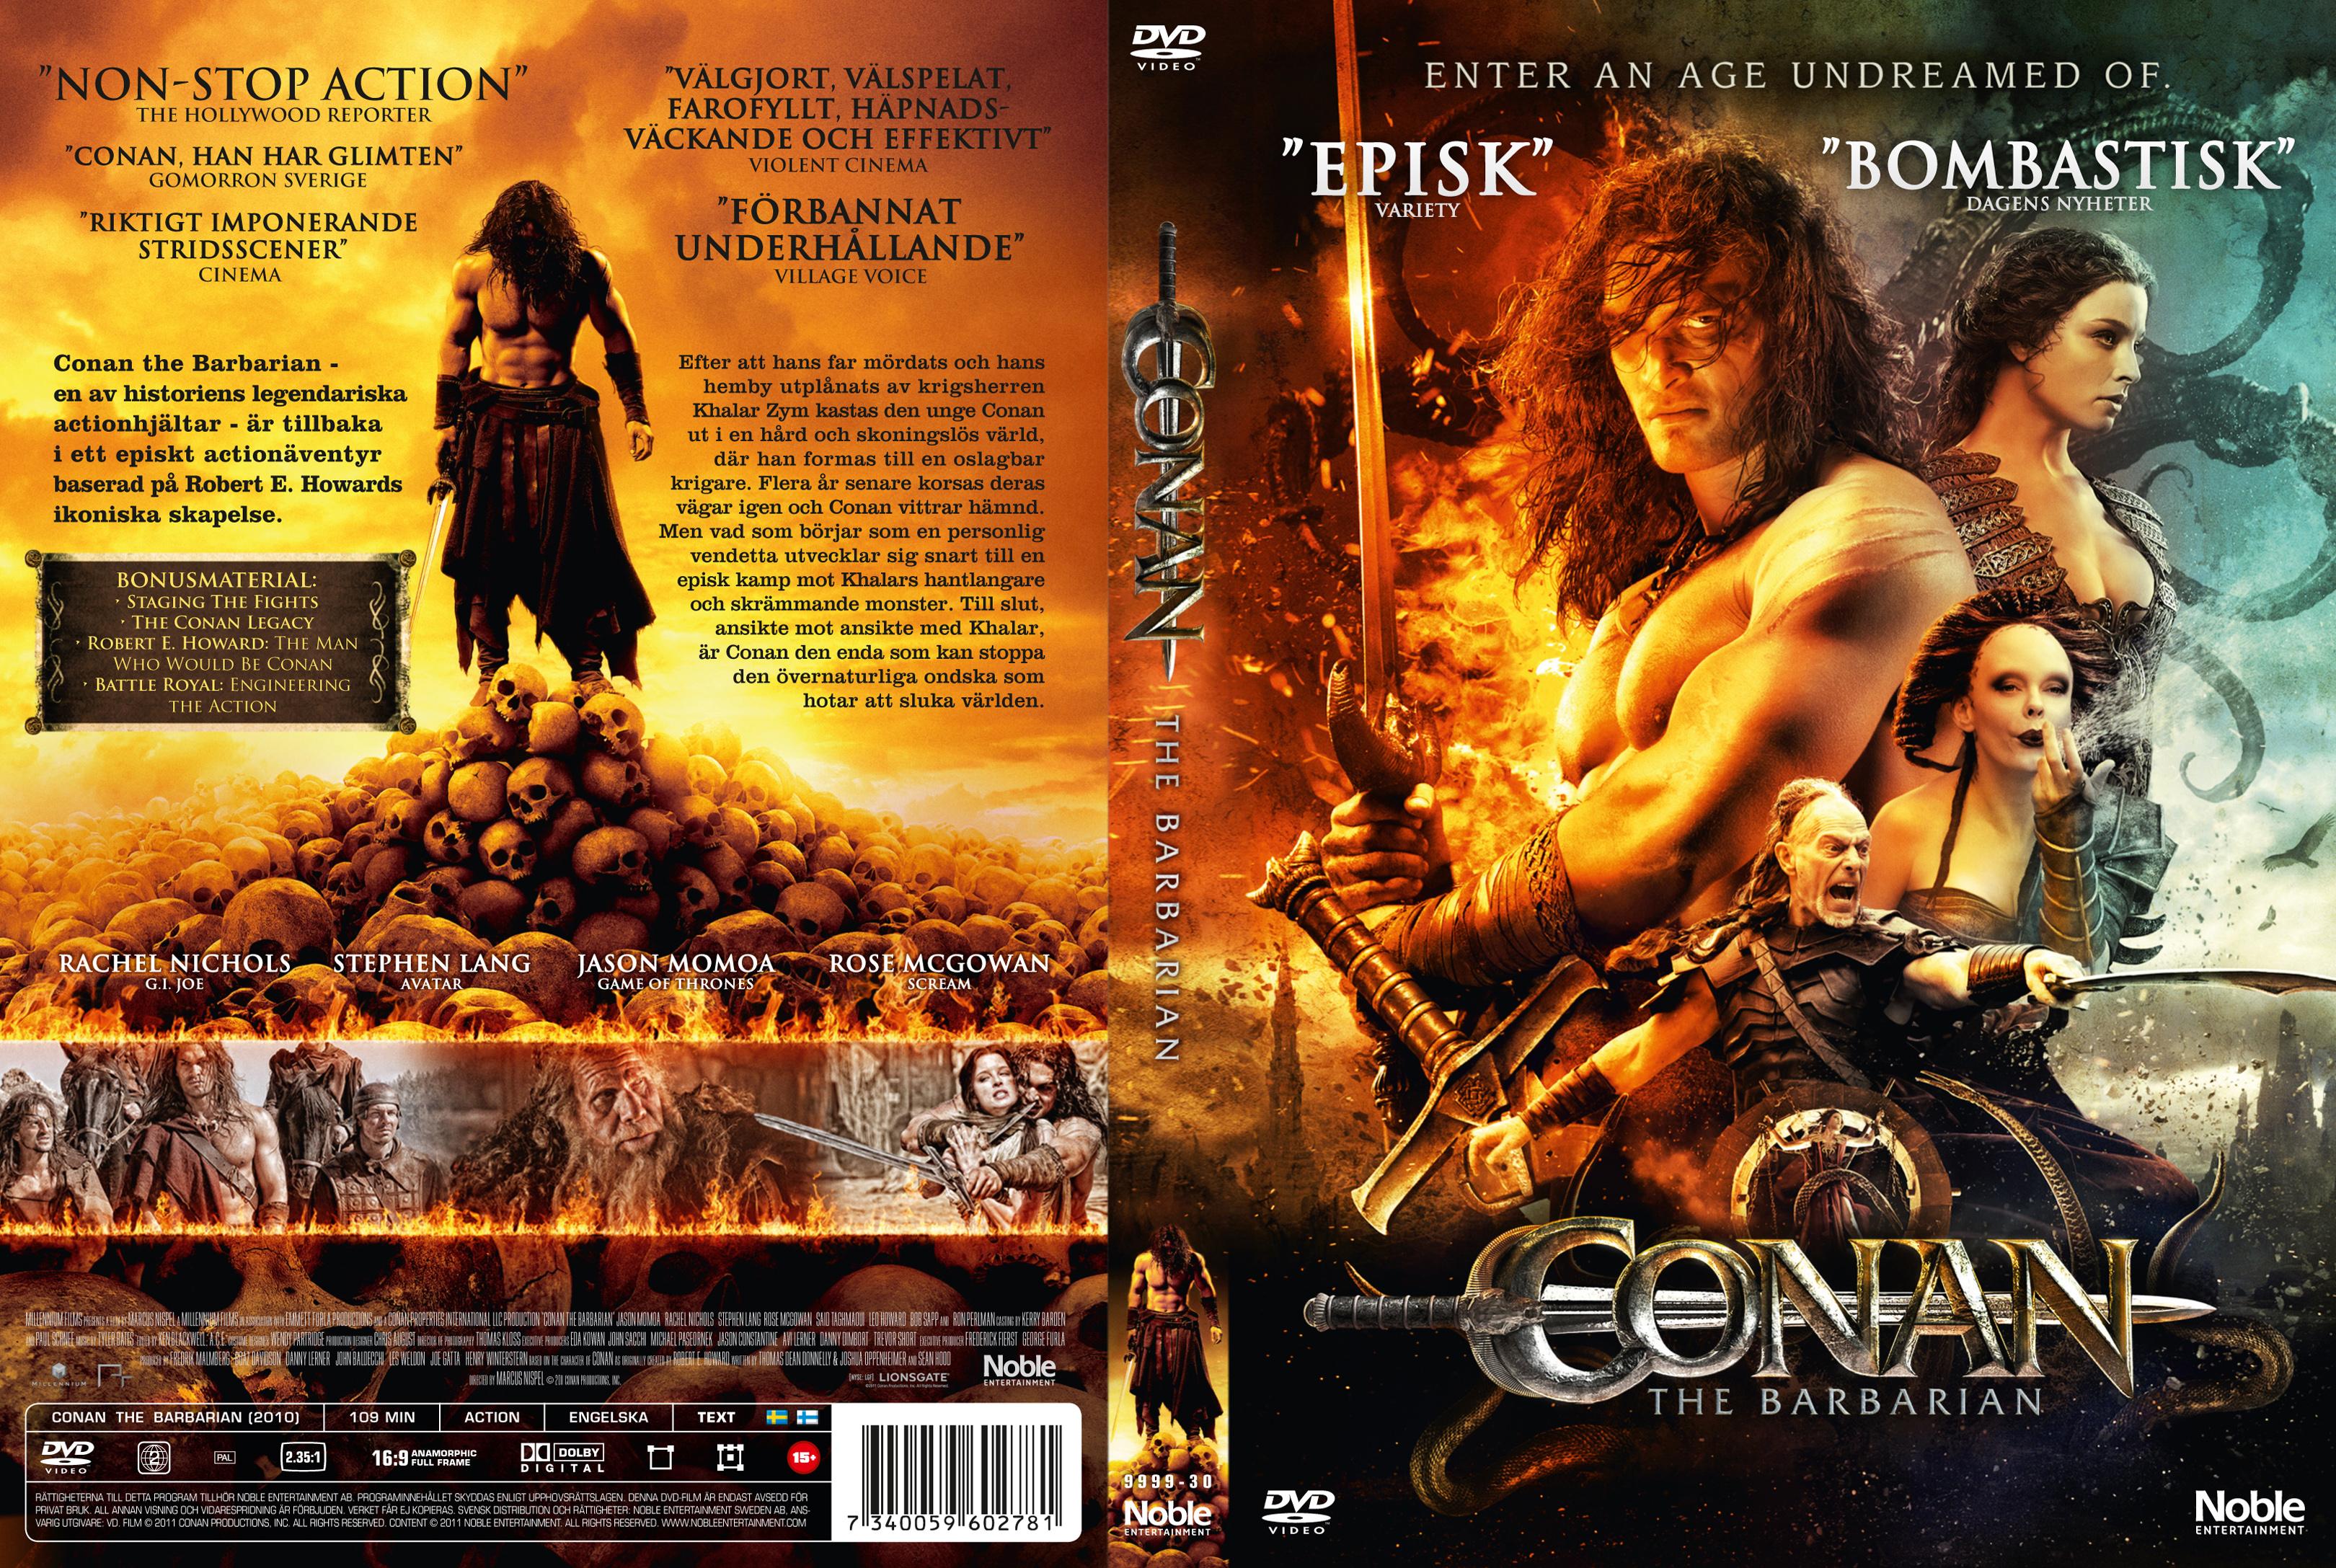 conan the barbarian 2011 download